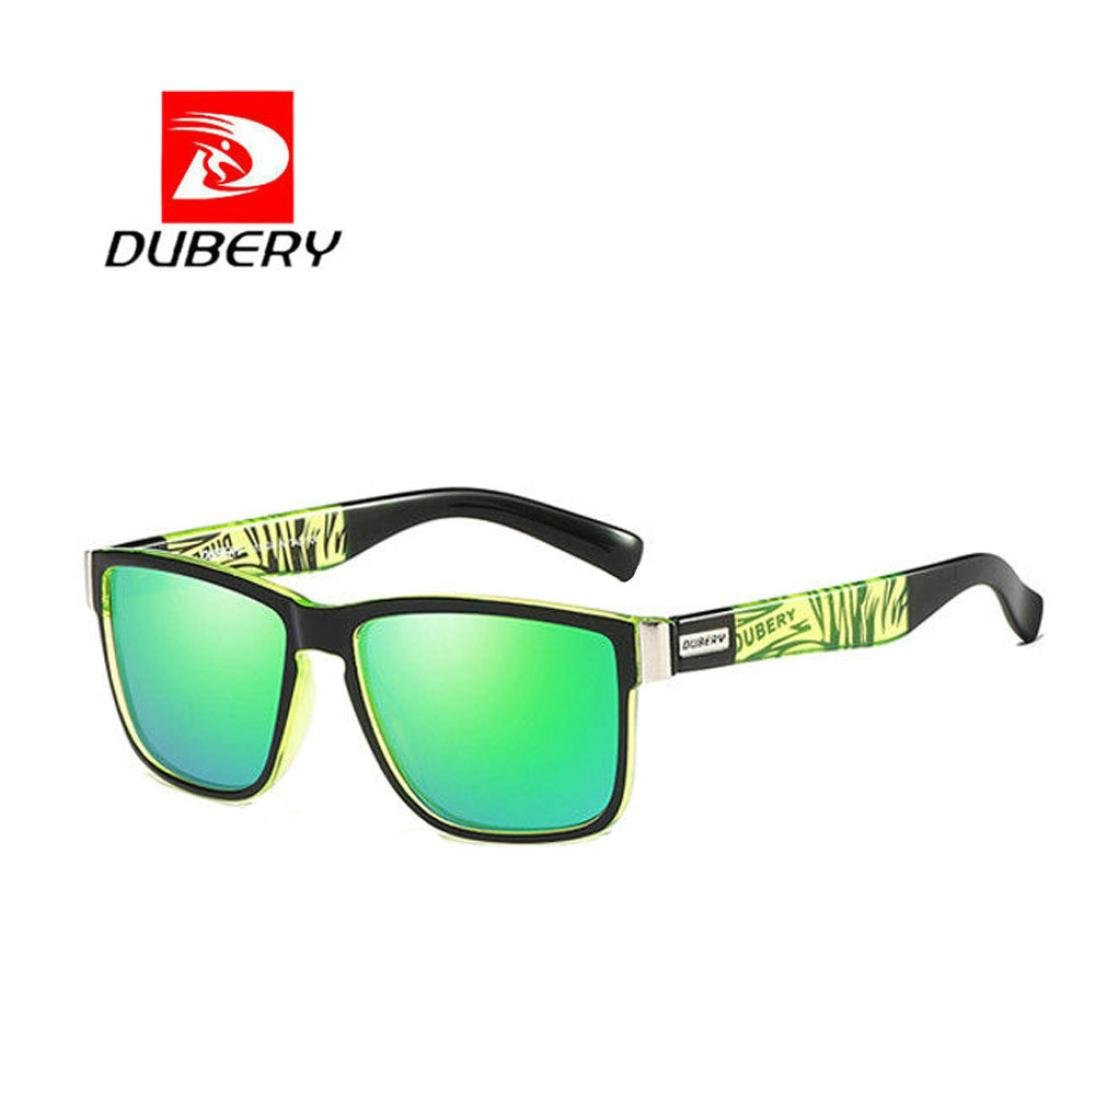 3ab47c7912 DUBERY Sunglasses Men s Polarized Sunglasses Outdoor Driving Men Women  Sport Frame Fishing Hunting Boating Glasses New